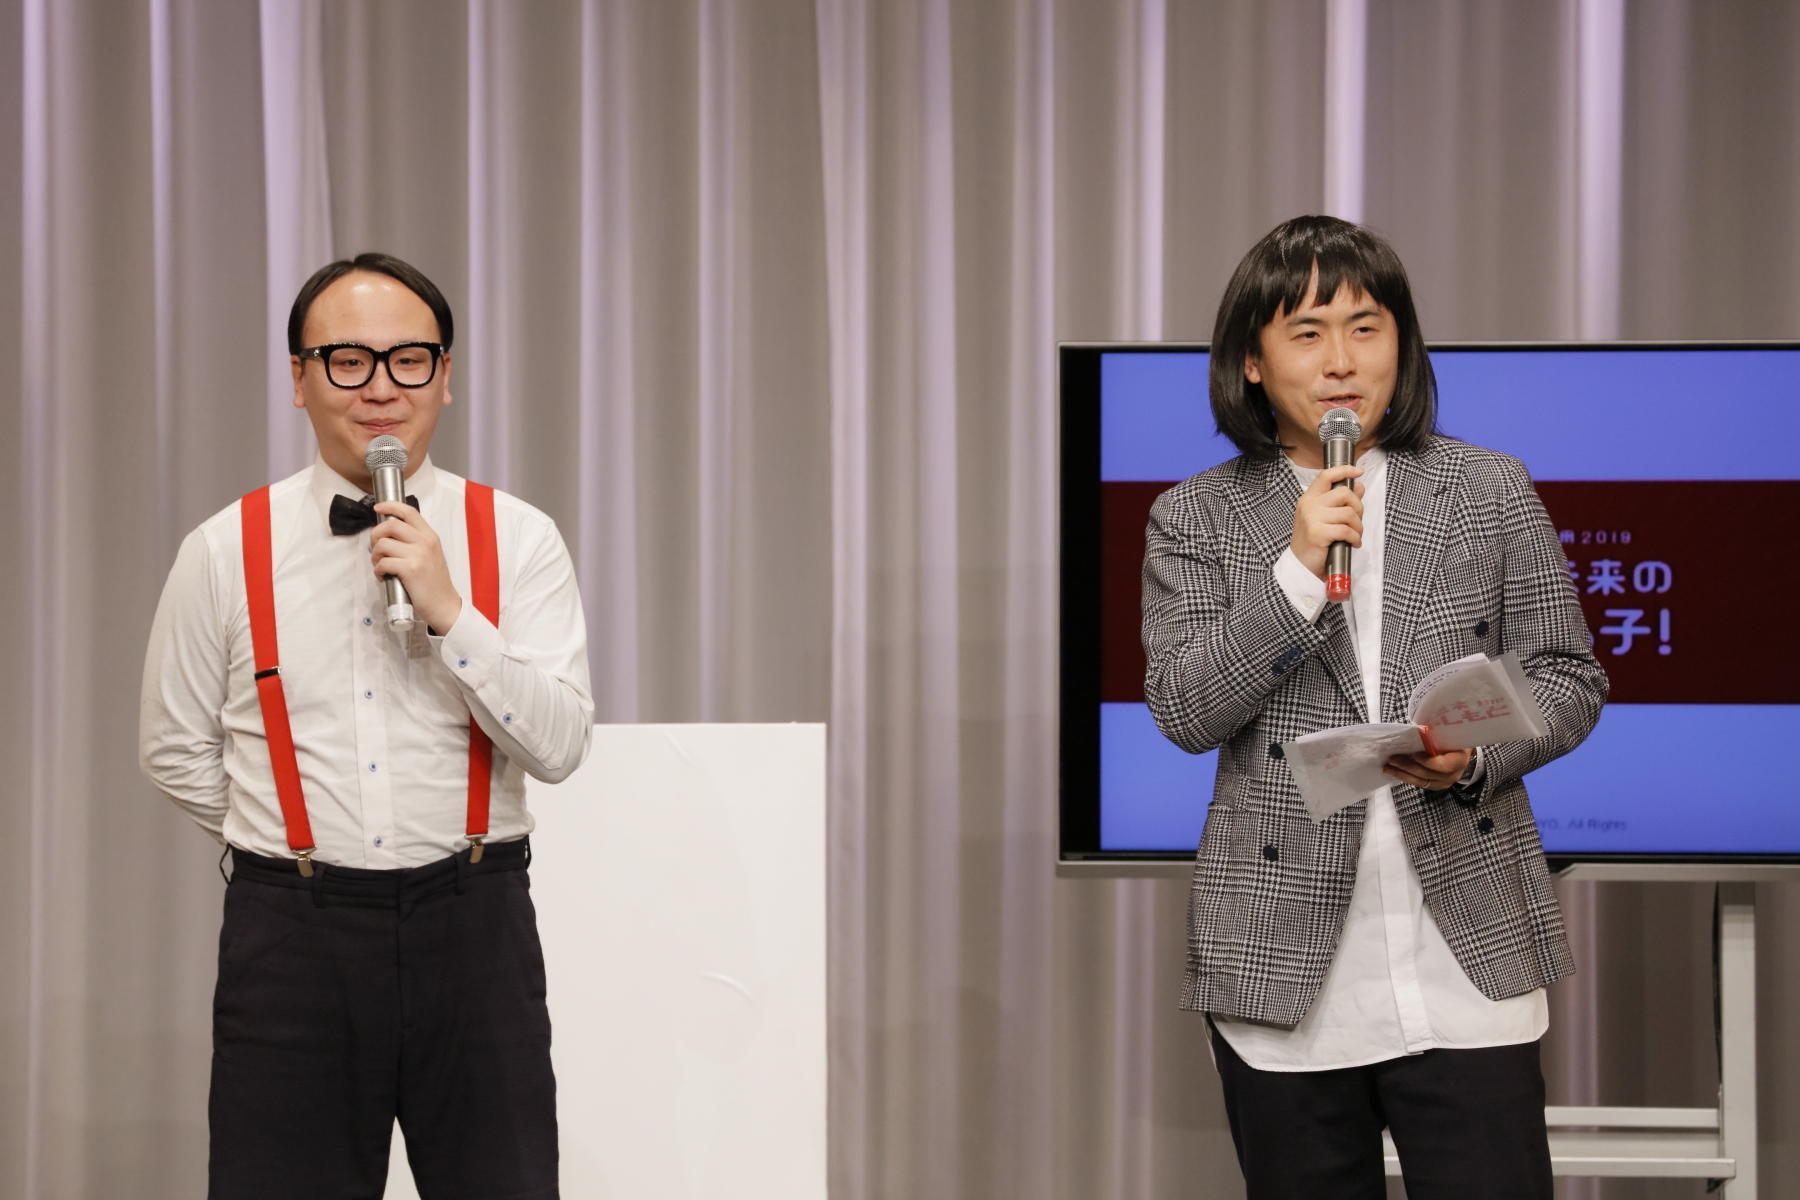 http://news.yoshimoto.co.jp/20180314164130-72935cf3cf718a0d930fcd33ce801f25e6de89a1.jpg